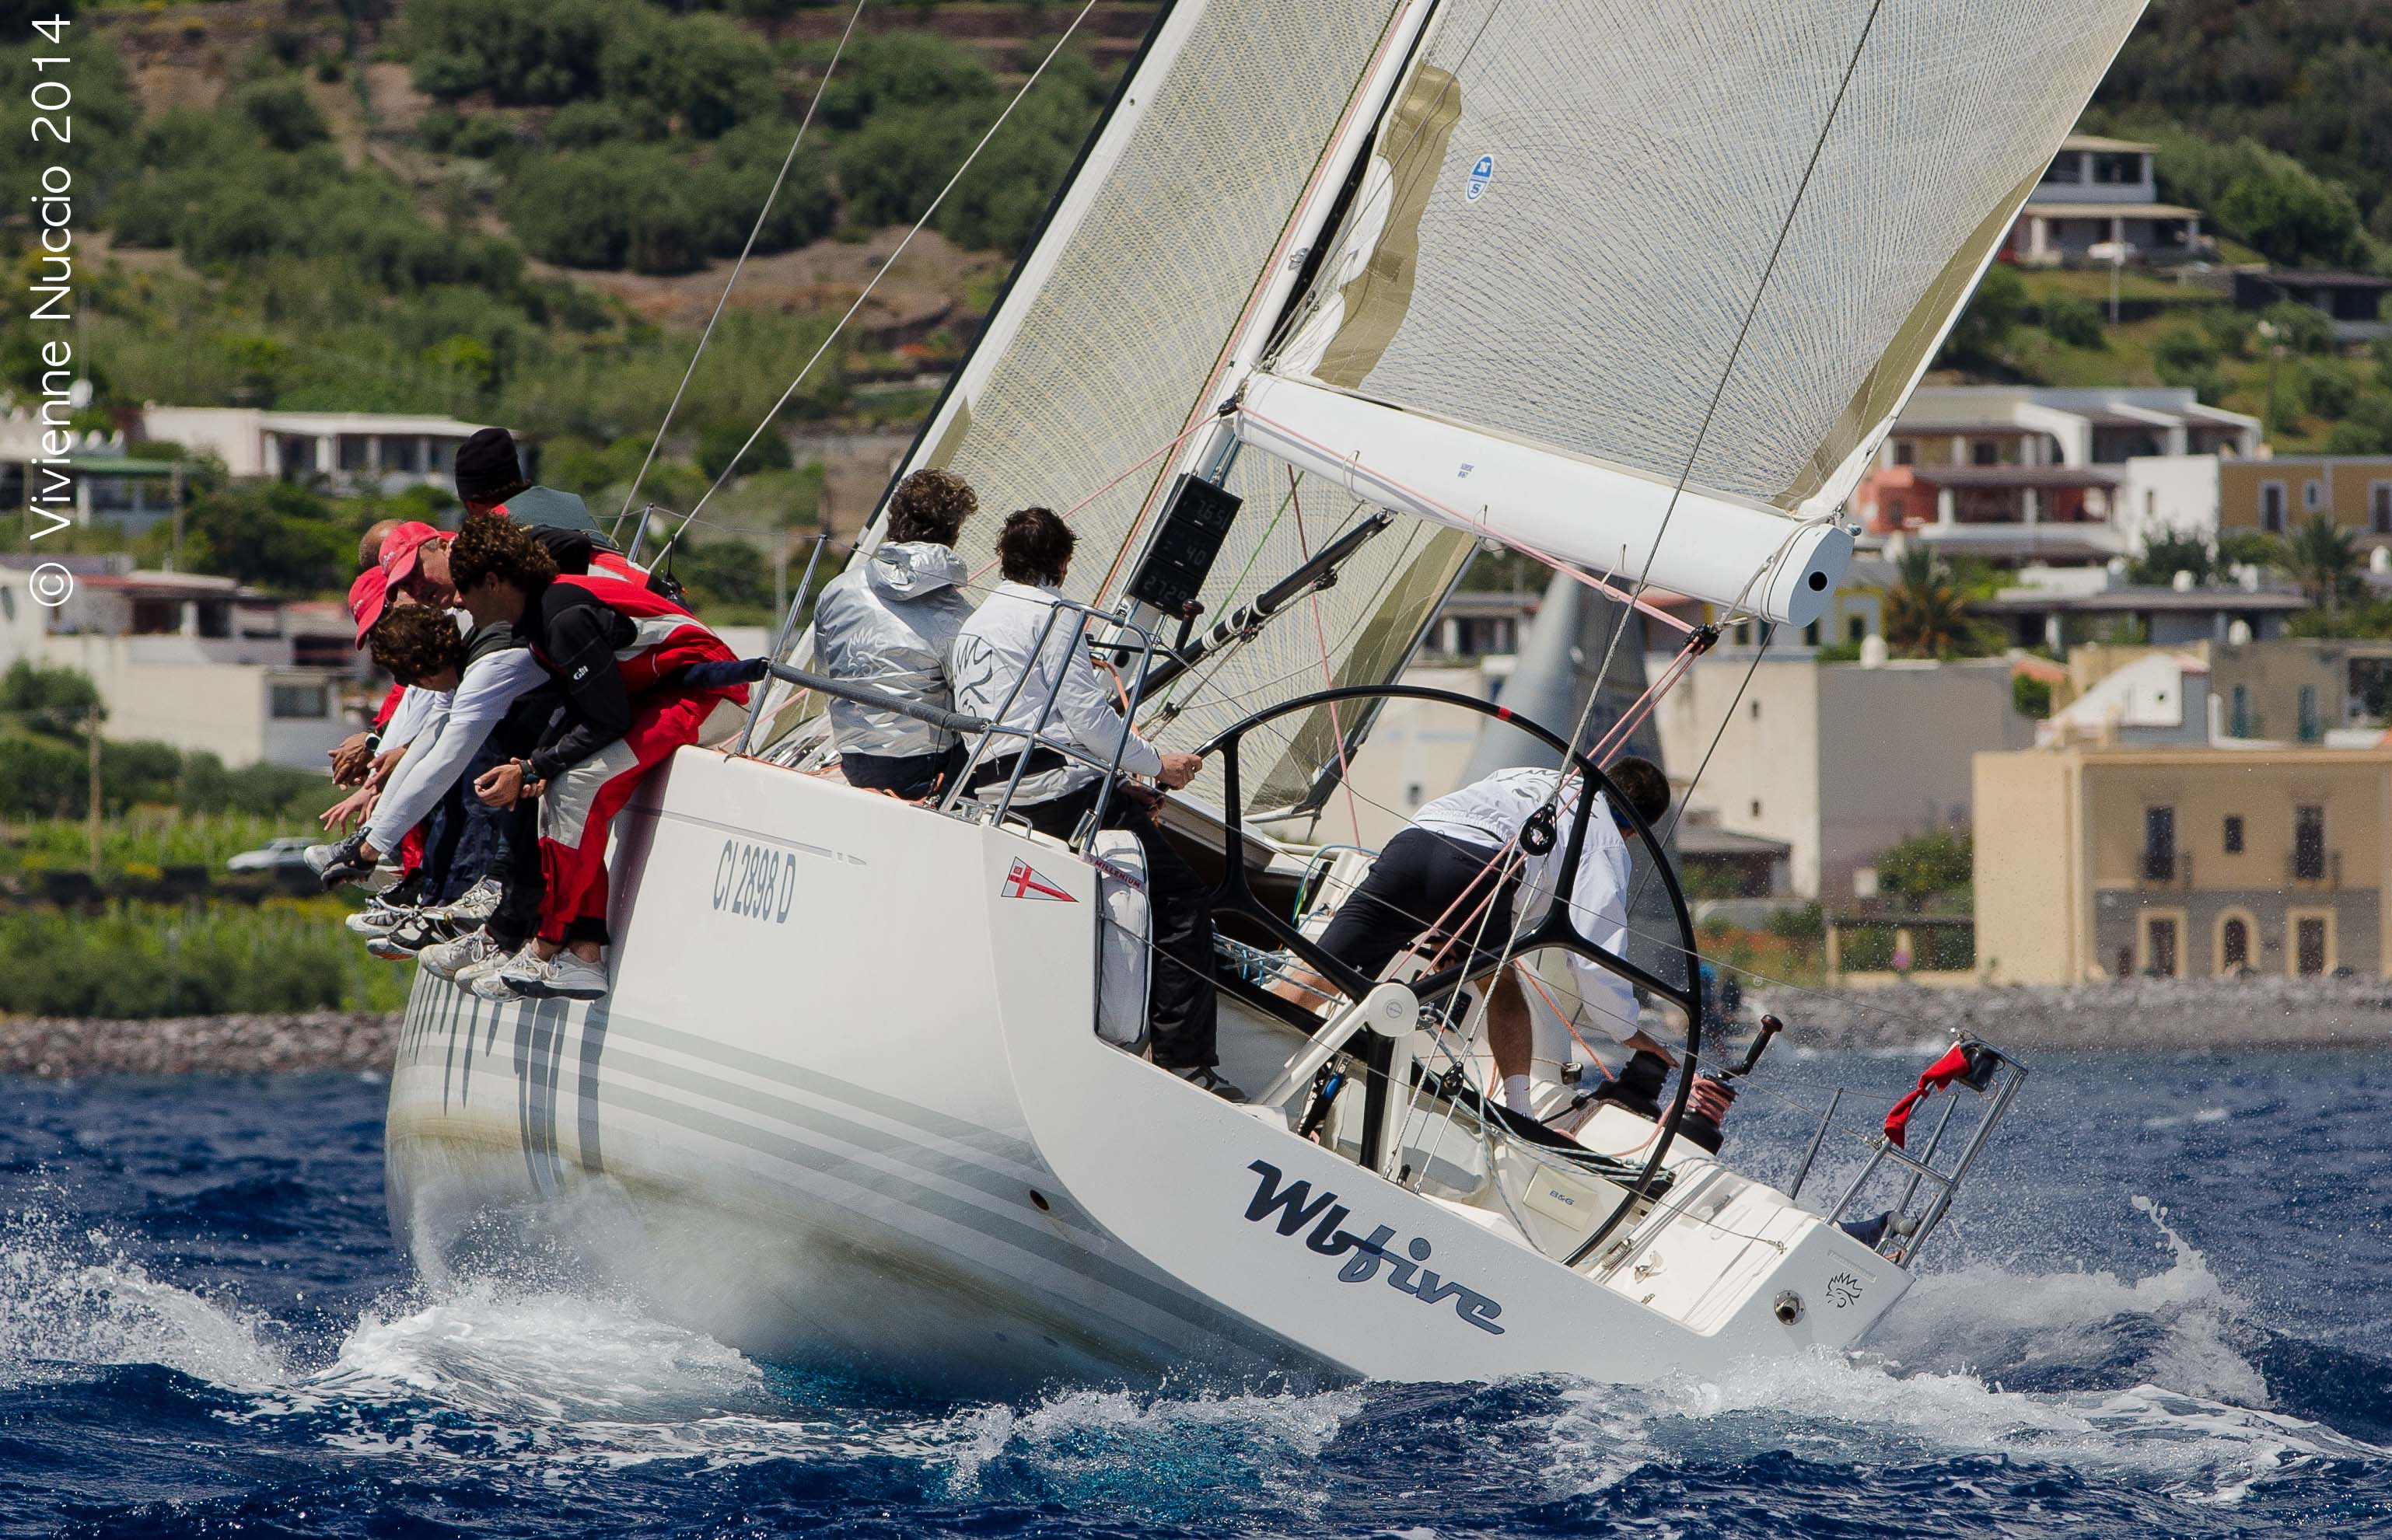 L'X41 Wbfive vincitore a Salina. Foto Nuccio